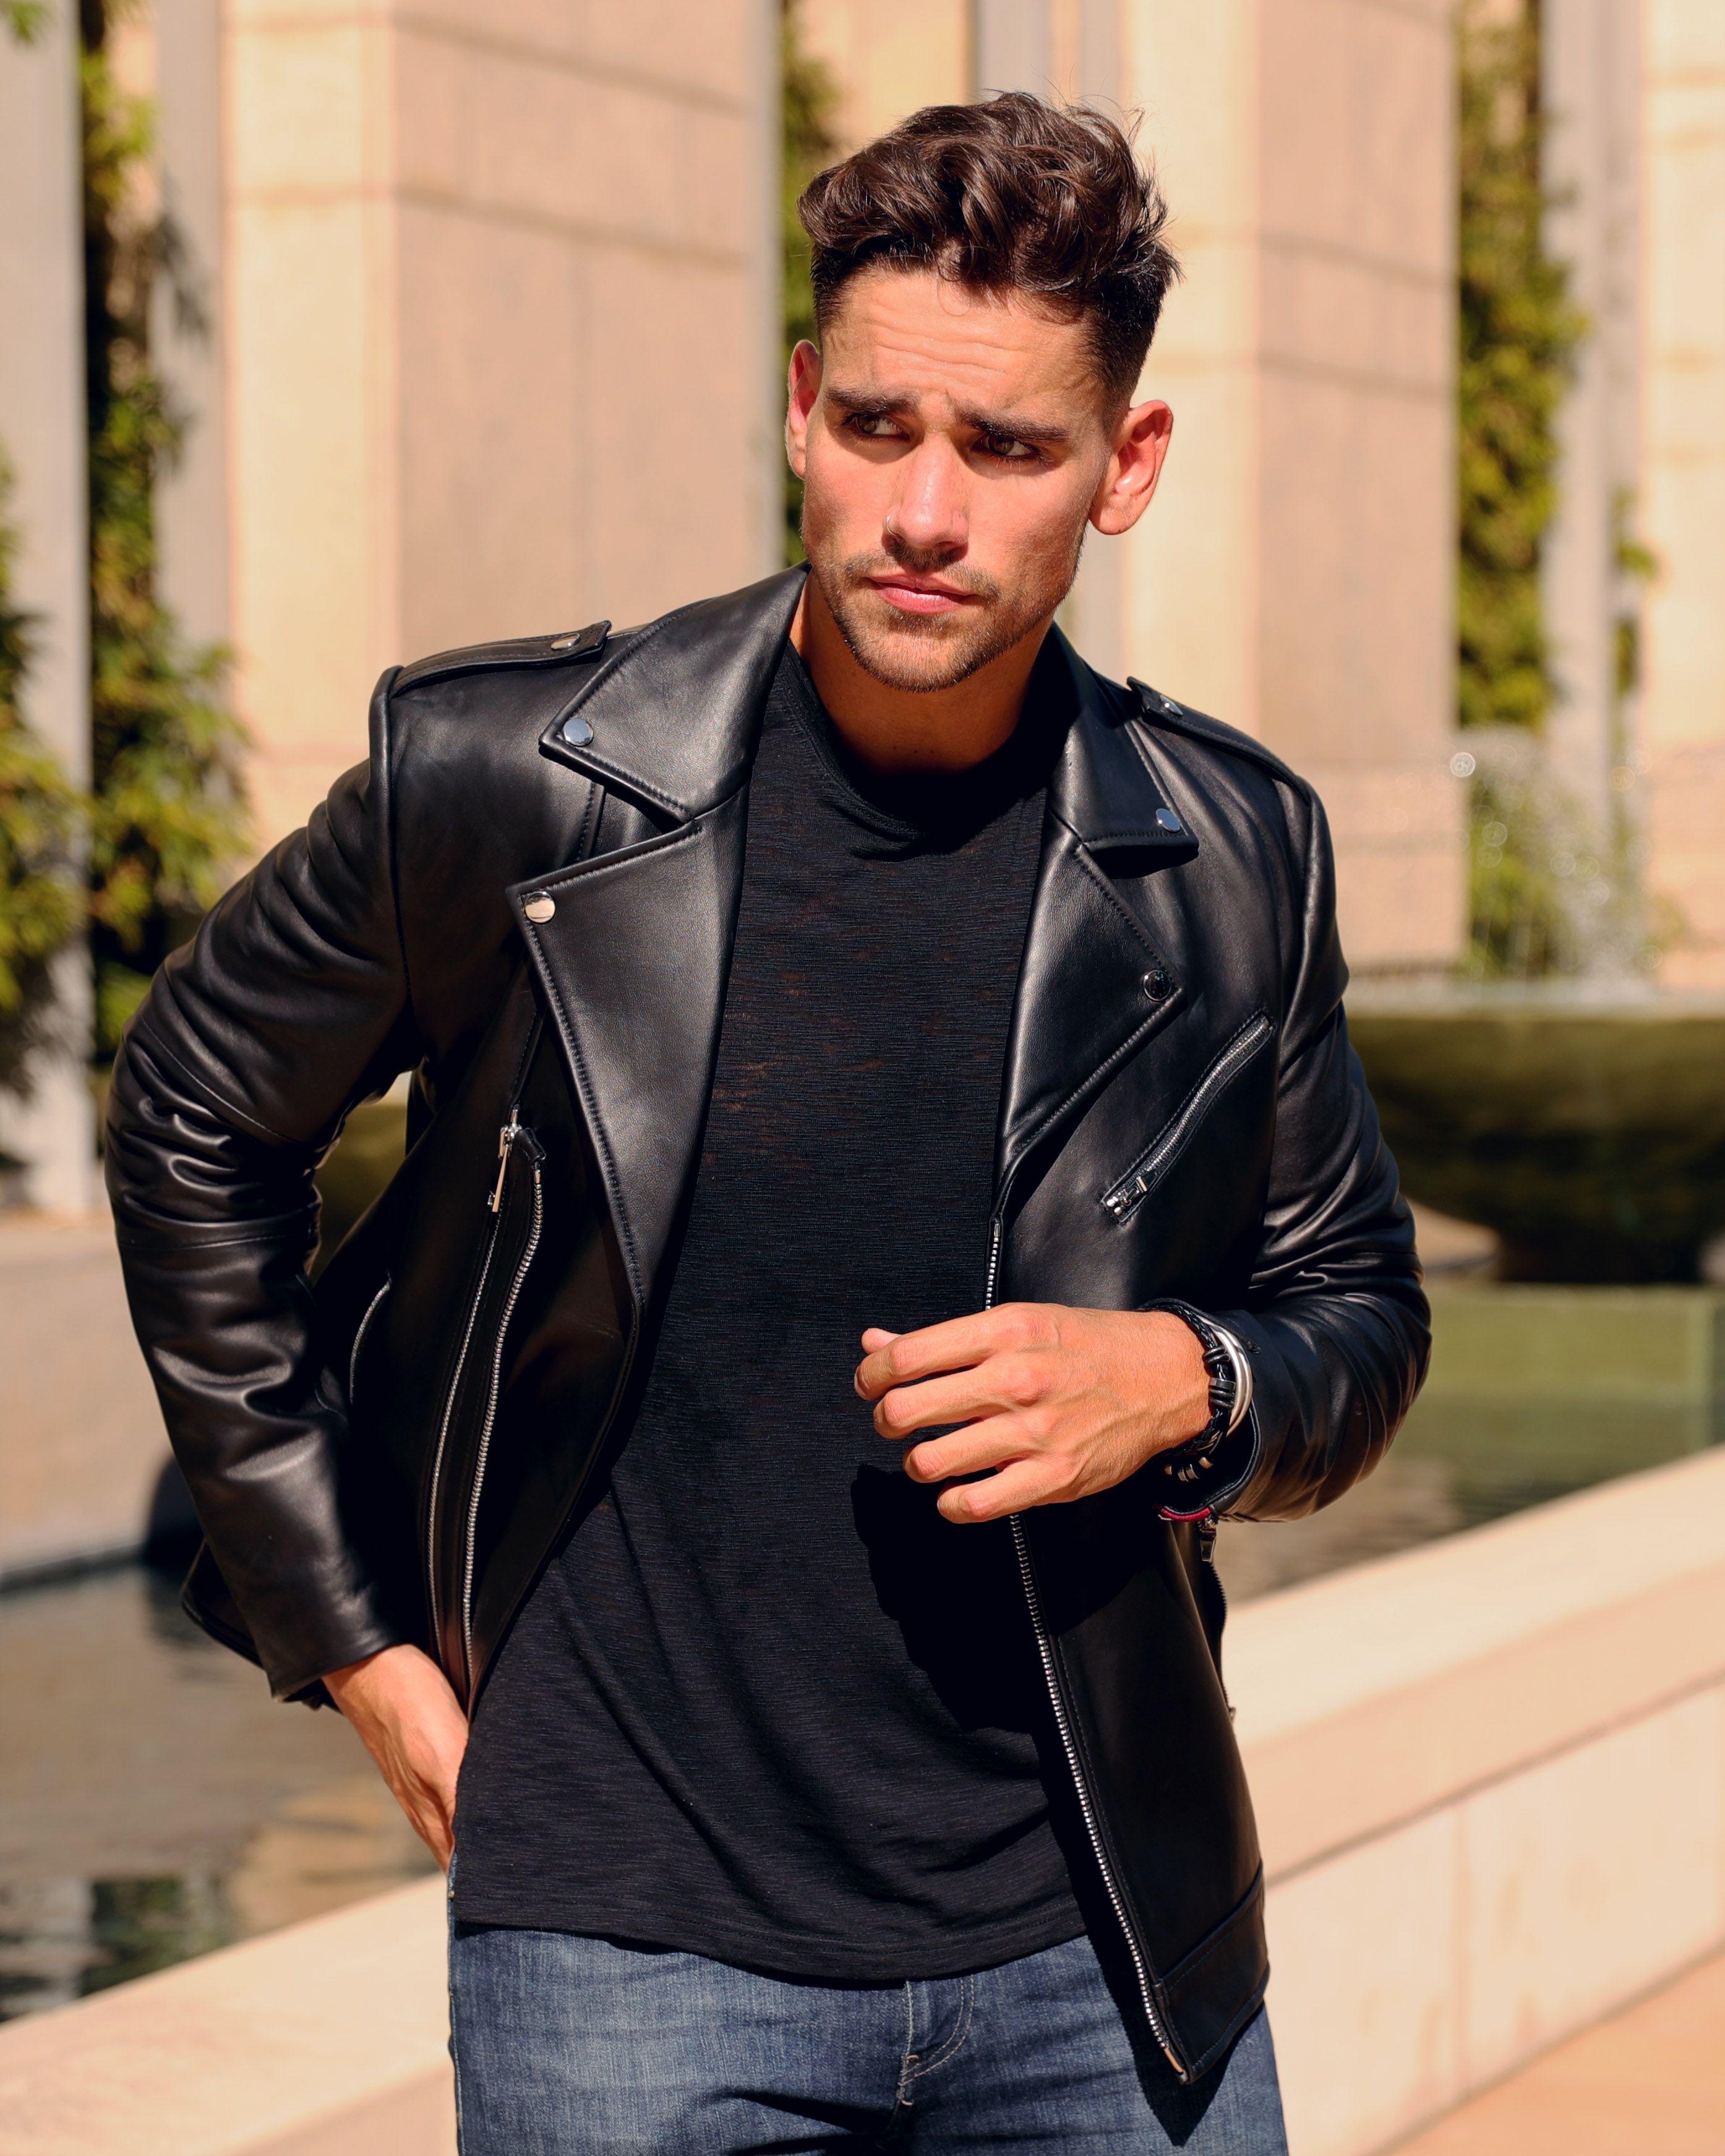 Apollo Leather Moto Jacket Leather Jacket Fashion Suits For Men Leather Jacket Men [ 3486 x 2789 Pixel ]